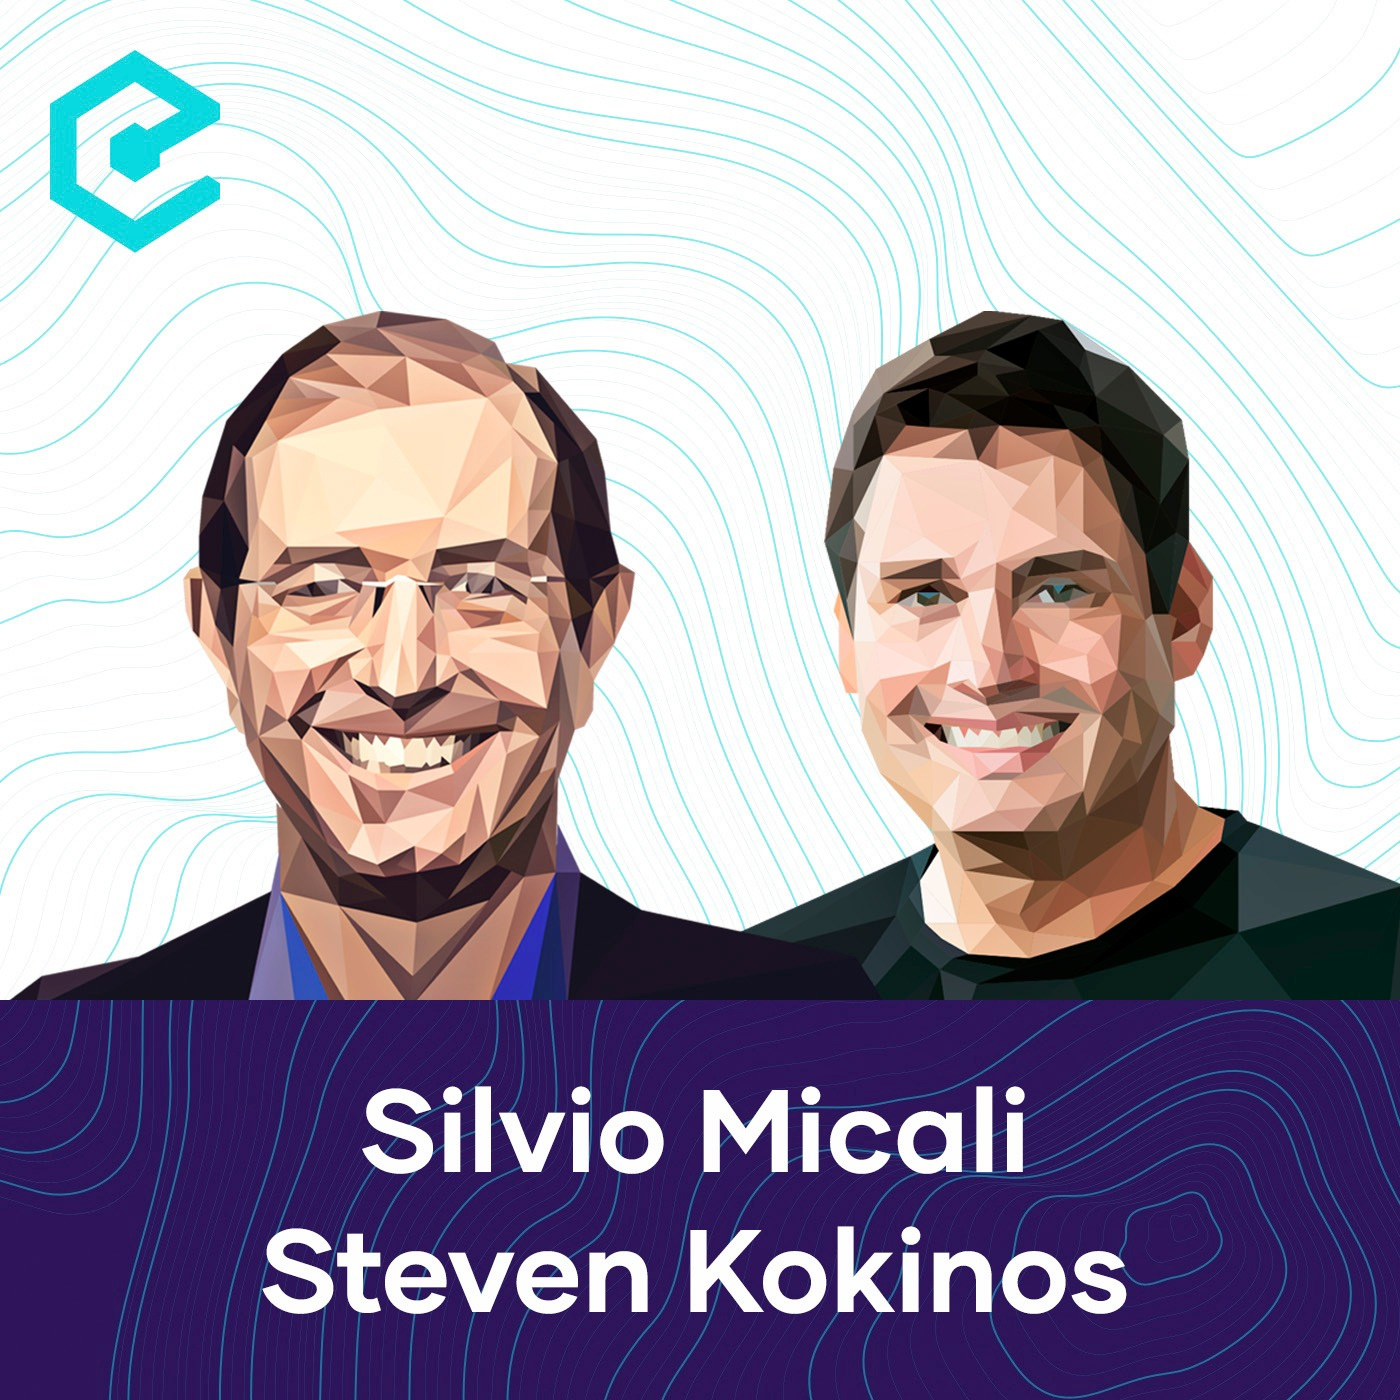 Silvio Micali & Steven Kokinos: Algorand – In Pursuit of the Blockchain Trilemma